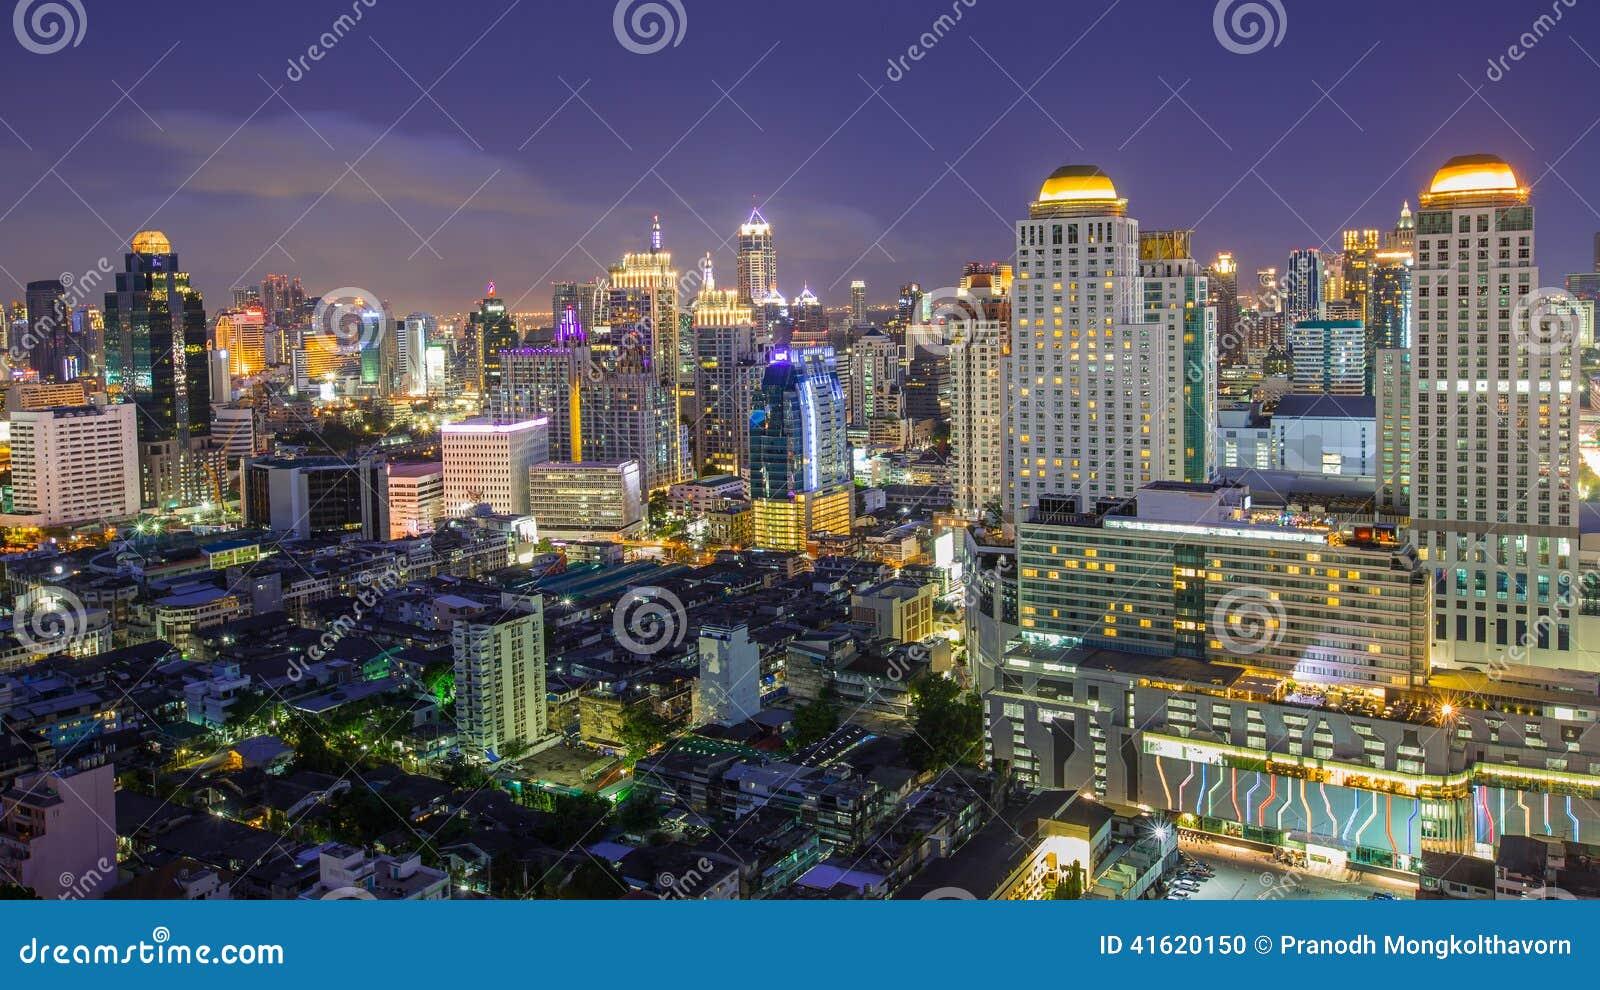 A view over the big asian city of Bangkok